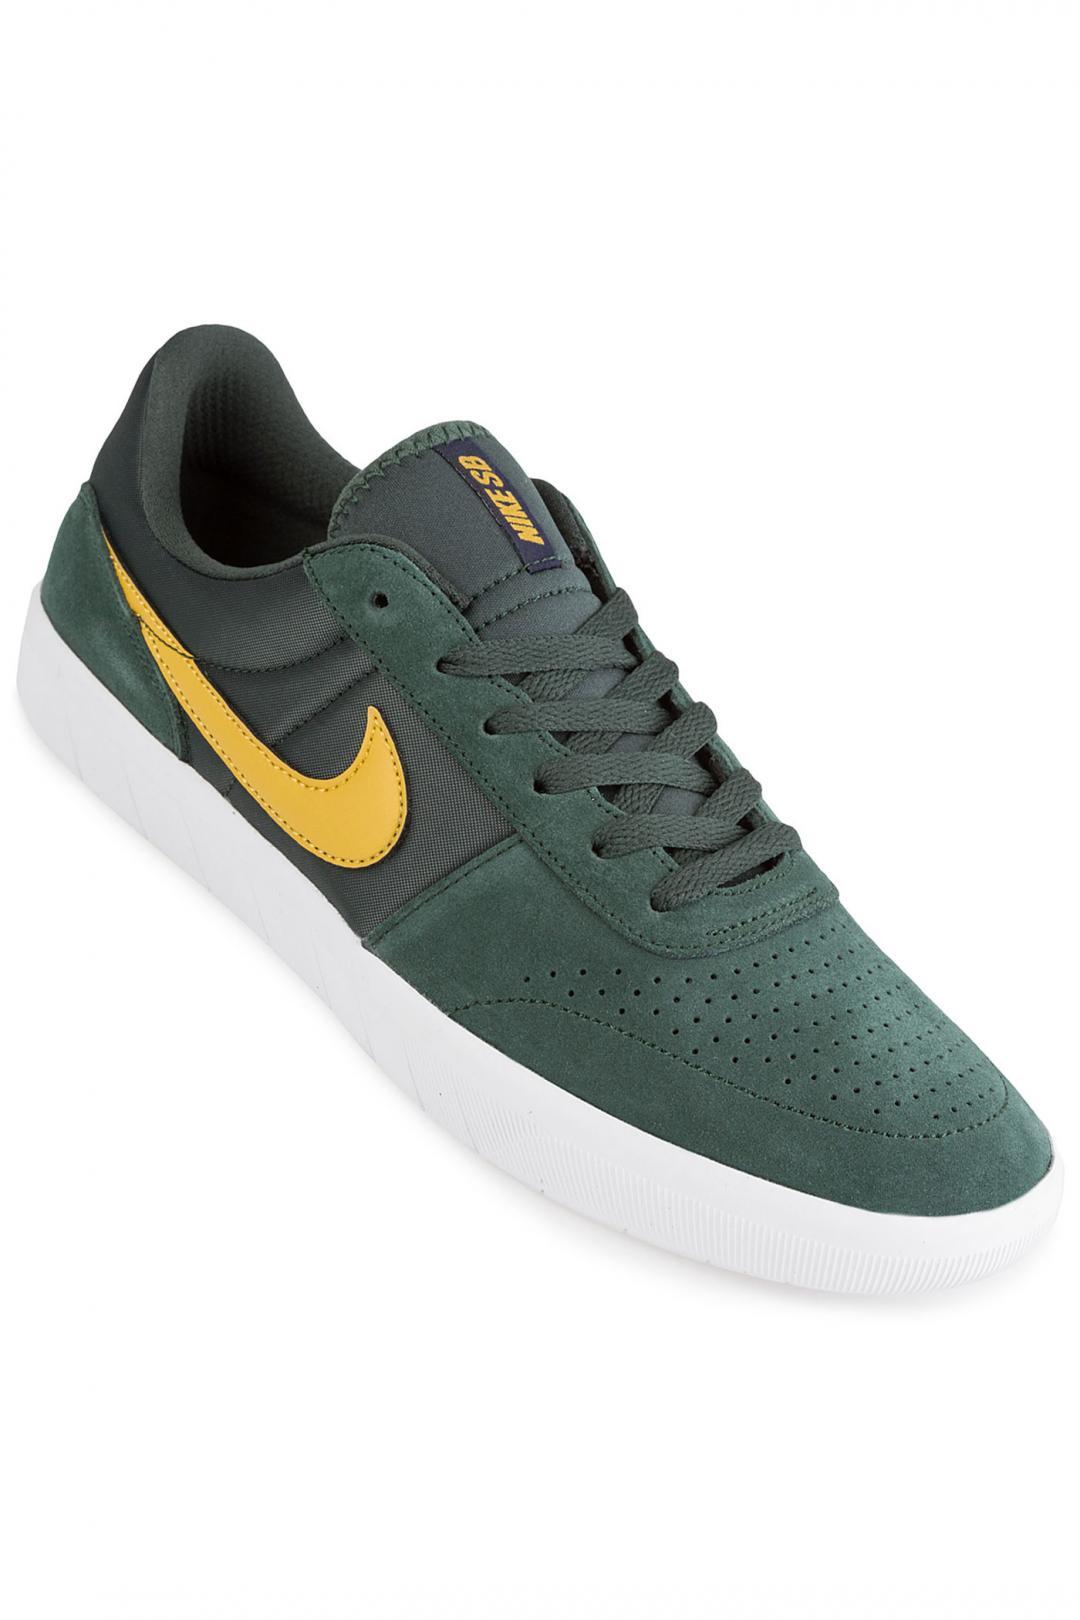 Uomo Nike SB Team Classic midnight green yellow ochre   Sneakers low top